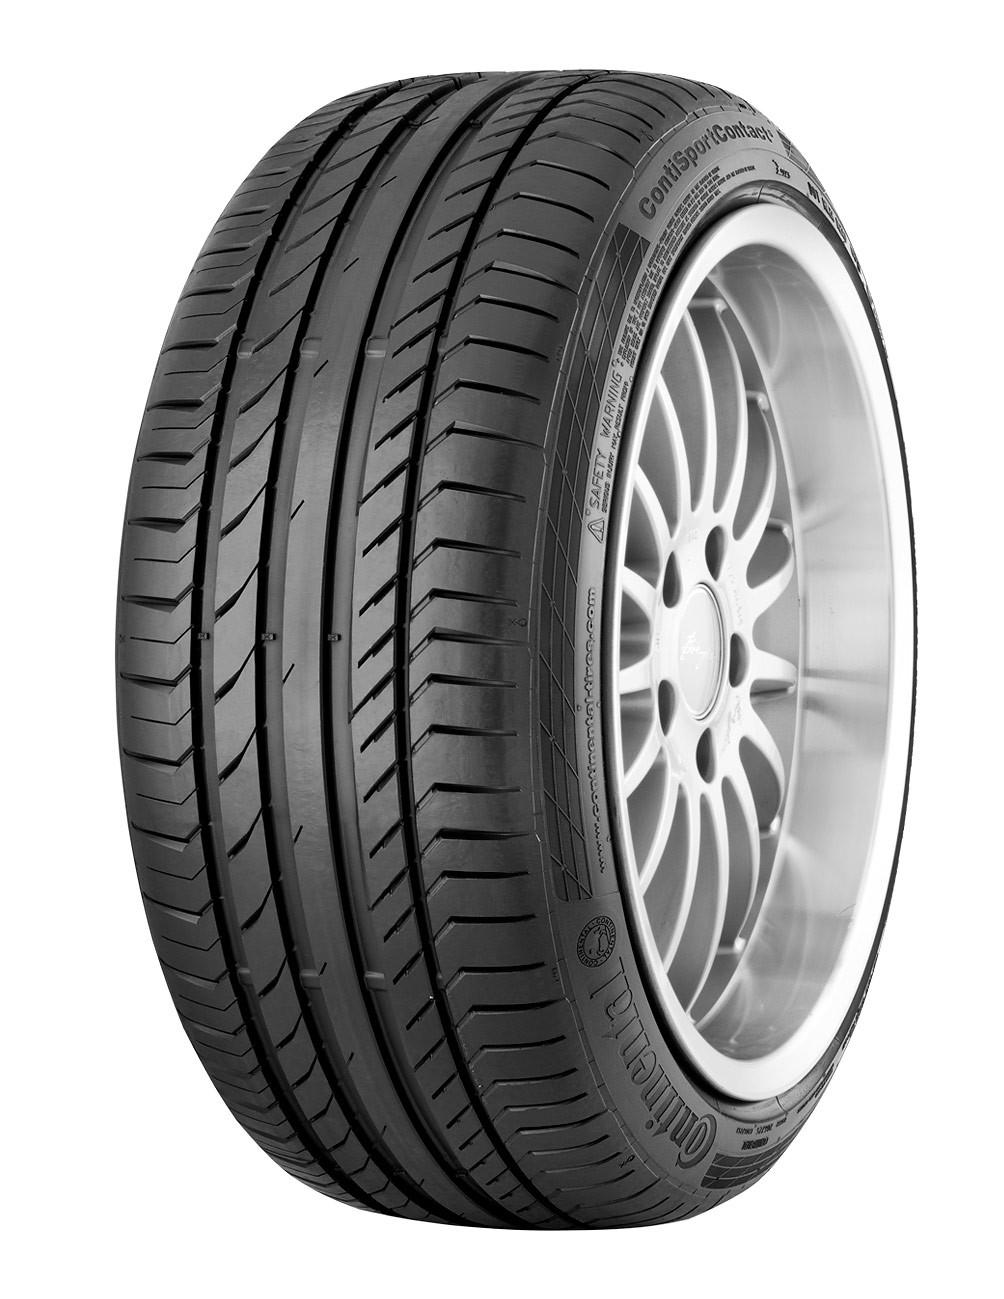 Anvelopa Vara 225/50R17 94w CONTINENTAL Sport Contact 5 Run Flat-XL